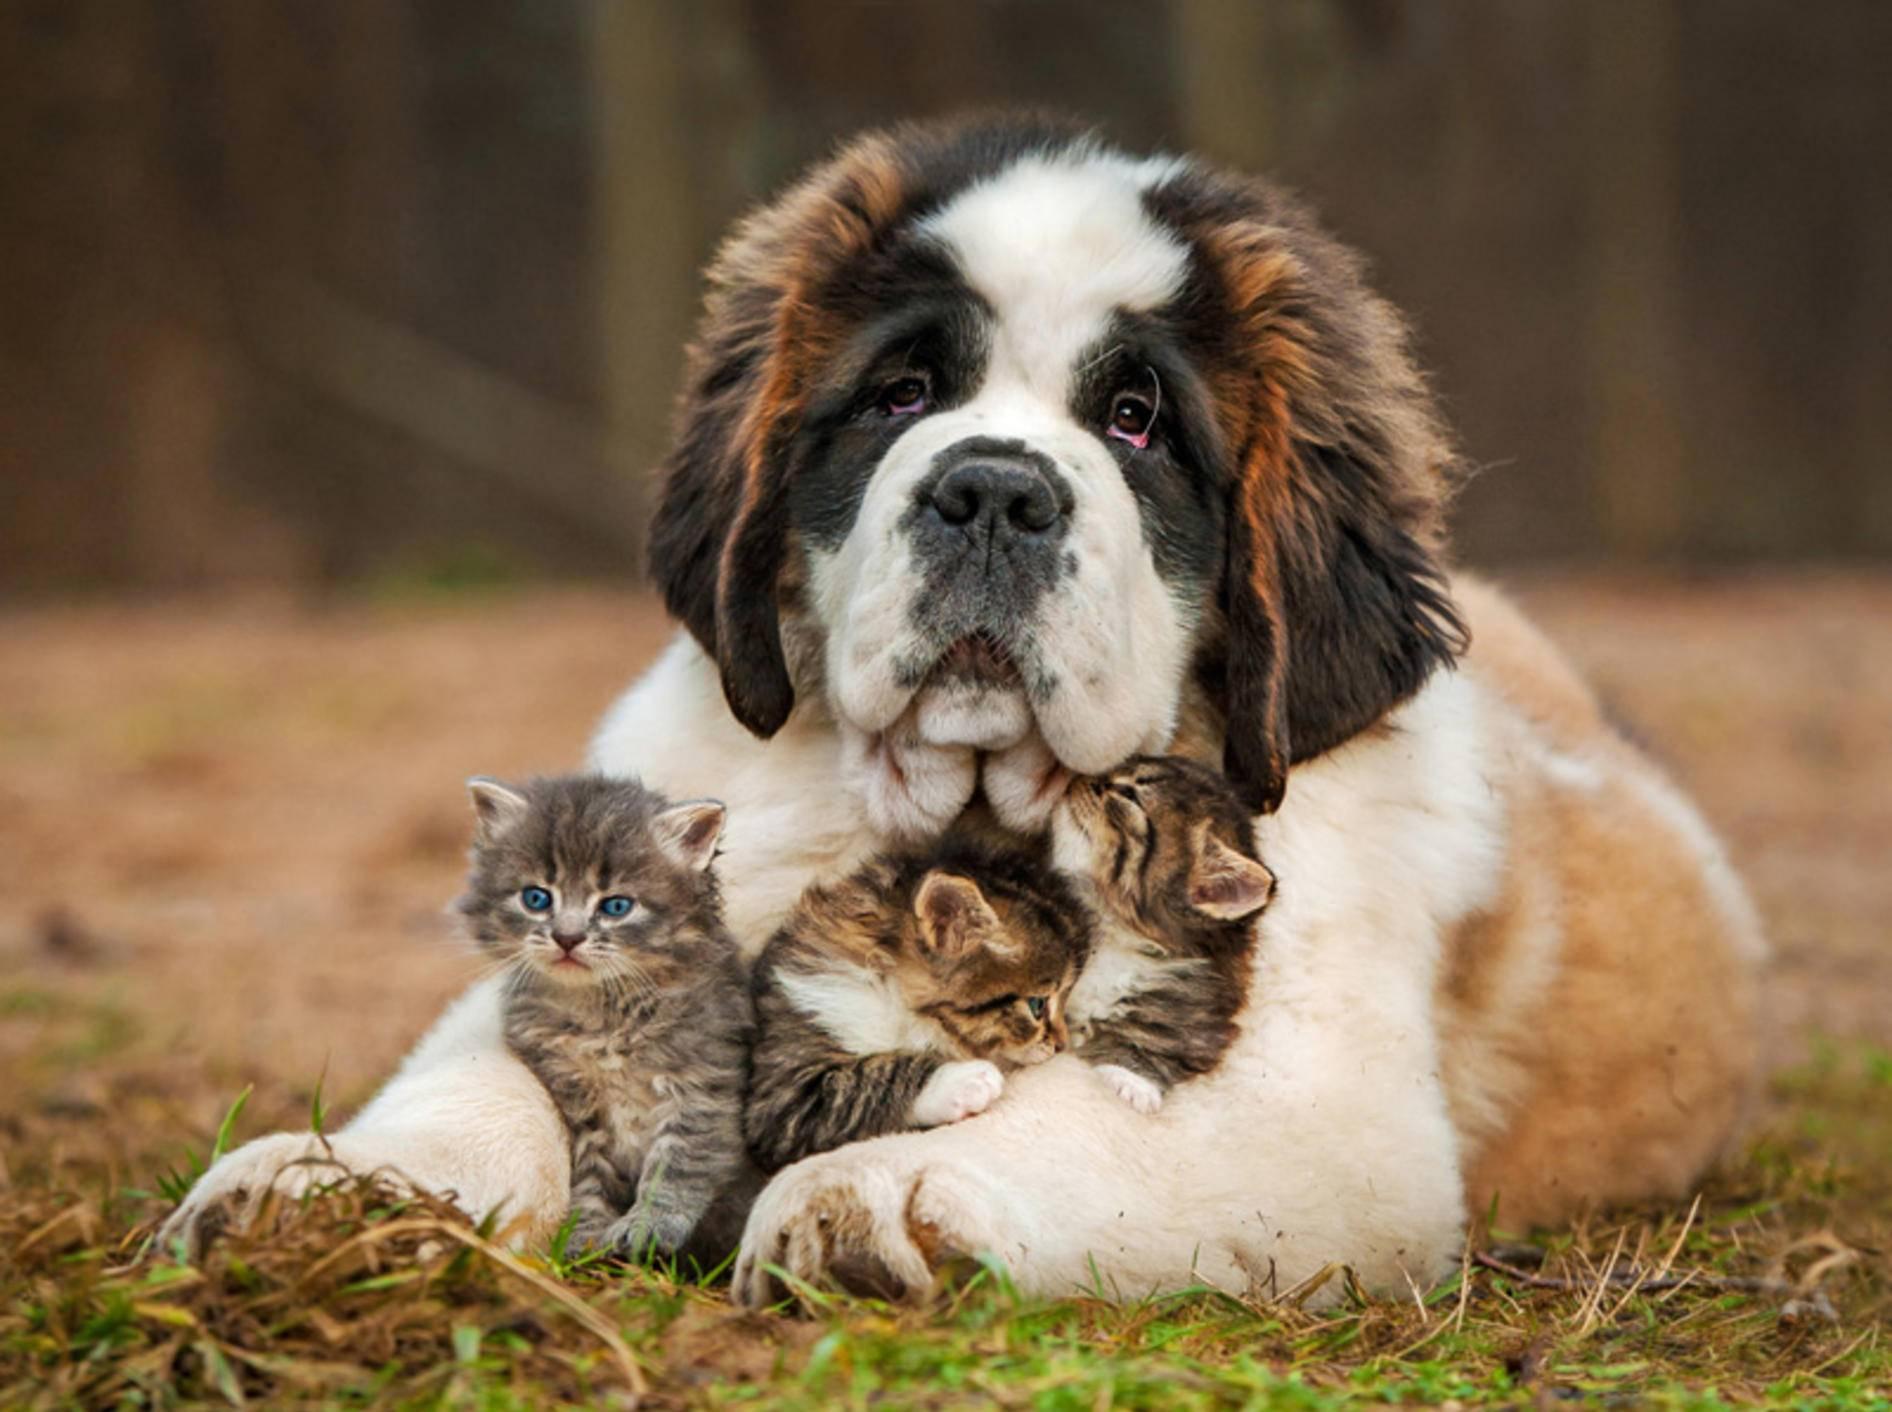 Toller Hund: Der Hütetrieb dieses Berhardiners kommt den Katzenbabys bestimmt zugute – Bild: Shutterstock / Grigorita Ko